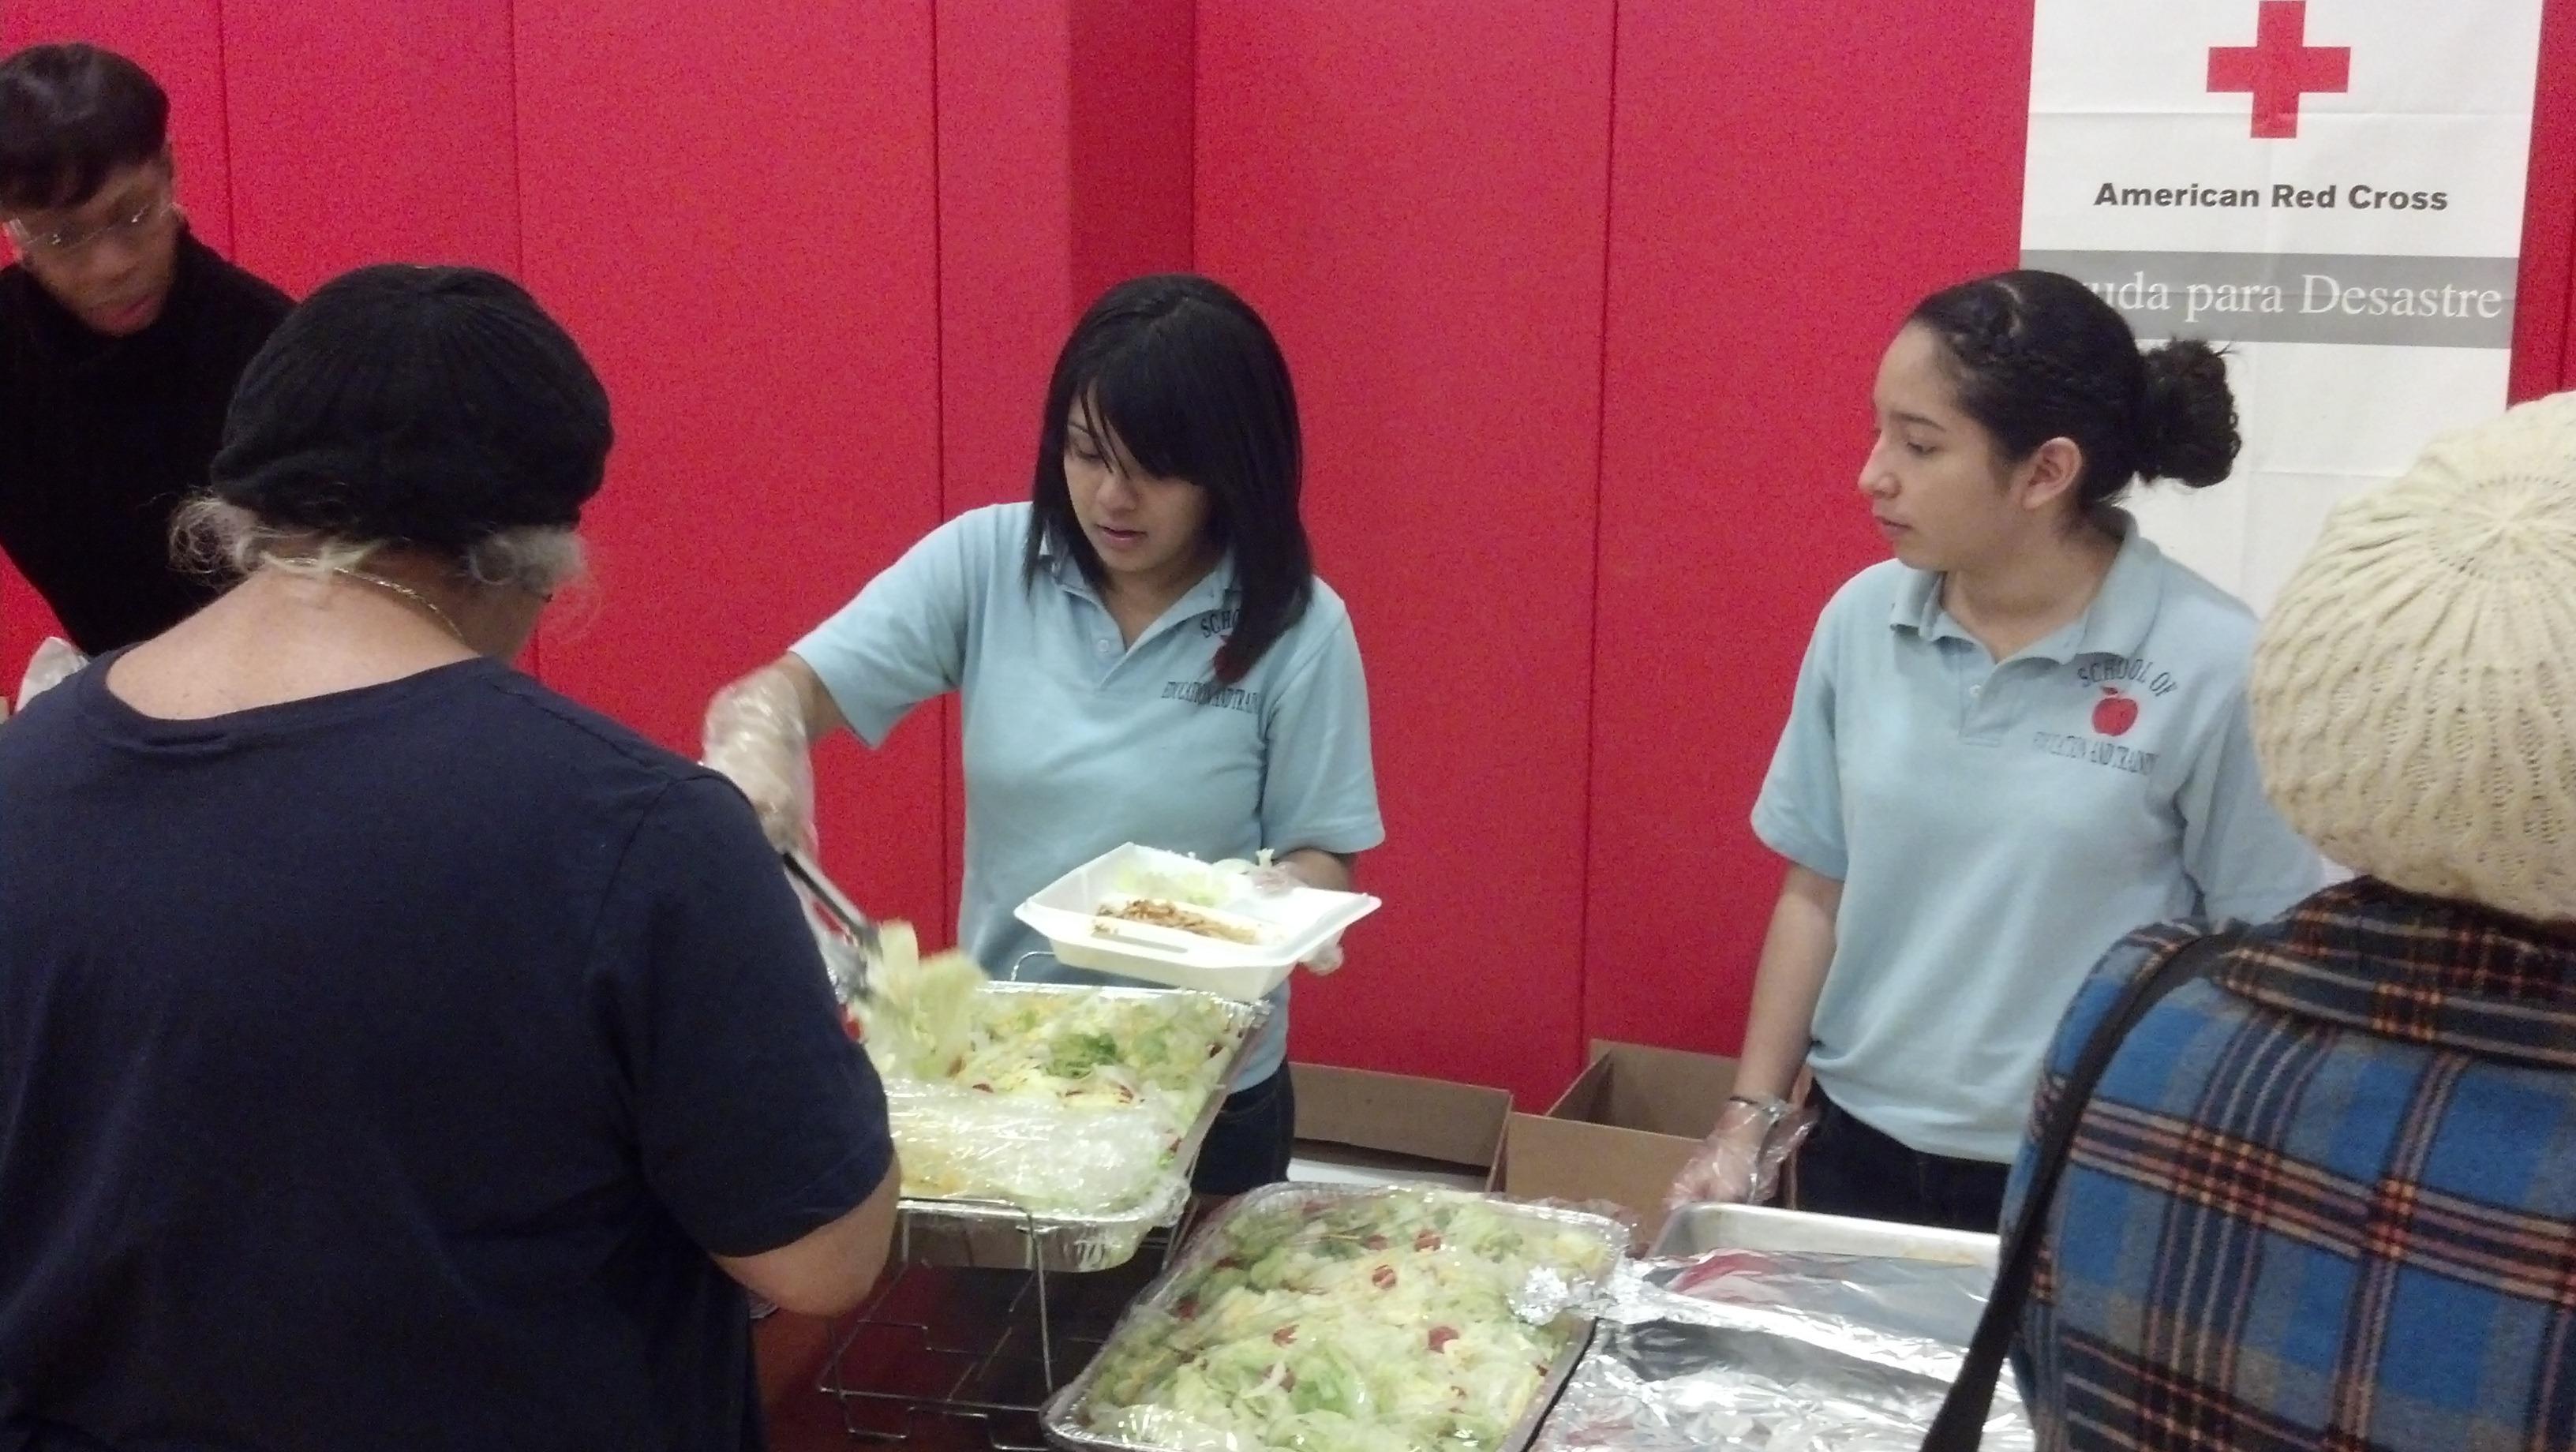 c5b97955b29f1029e4e9_jfk_robotics_members_serving_food.jpg